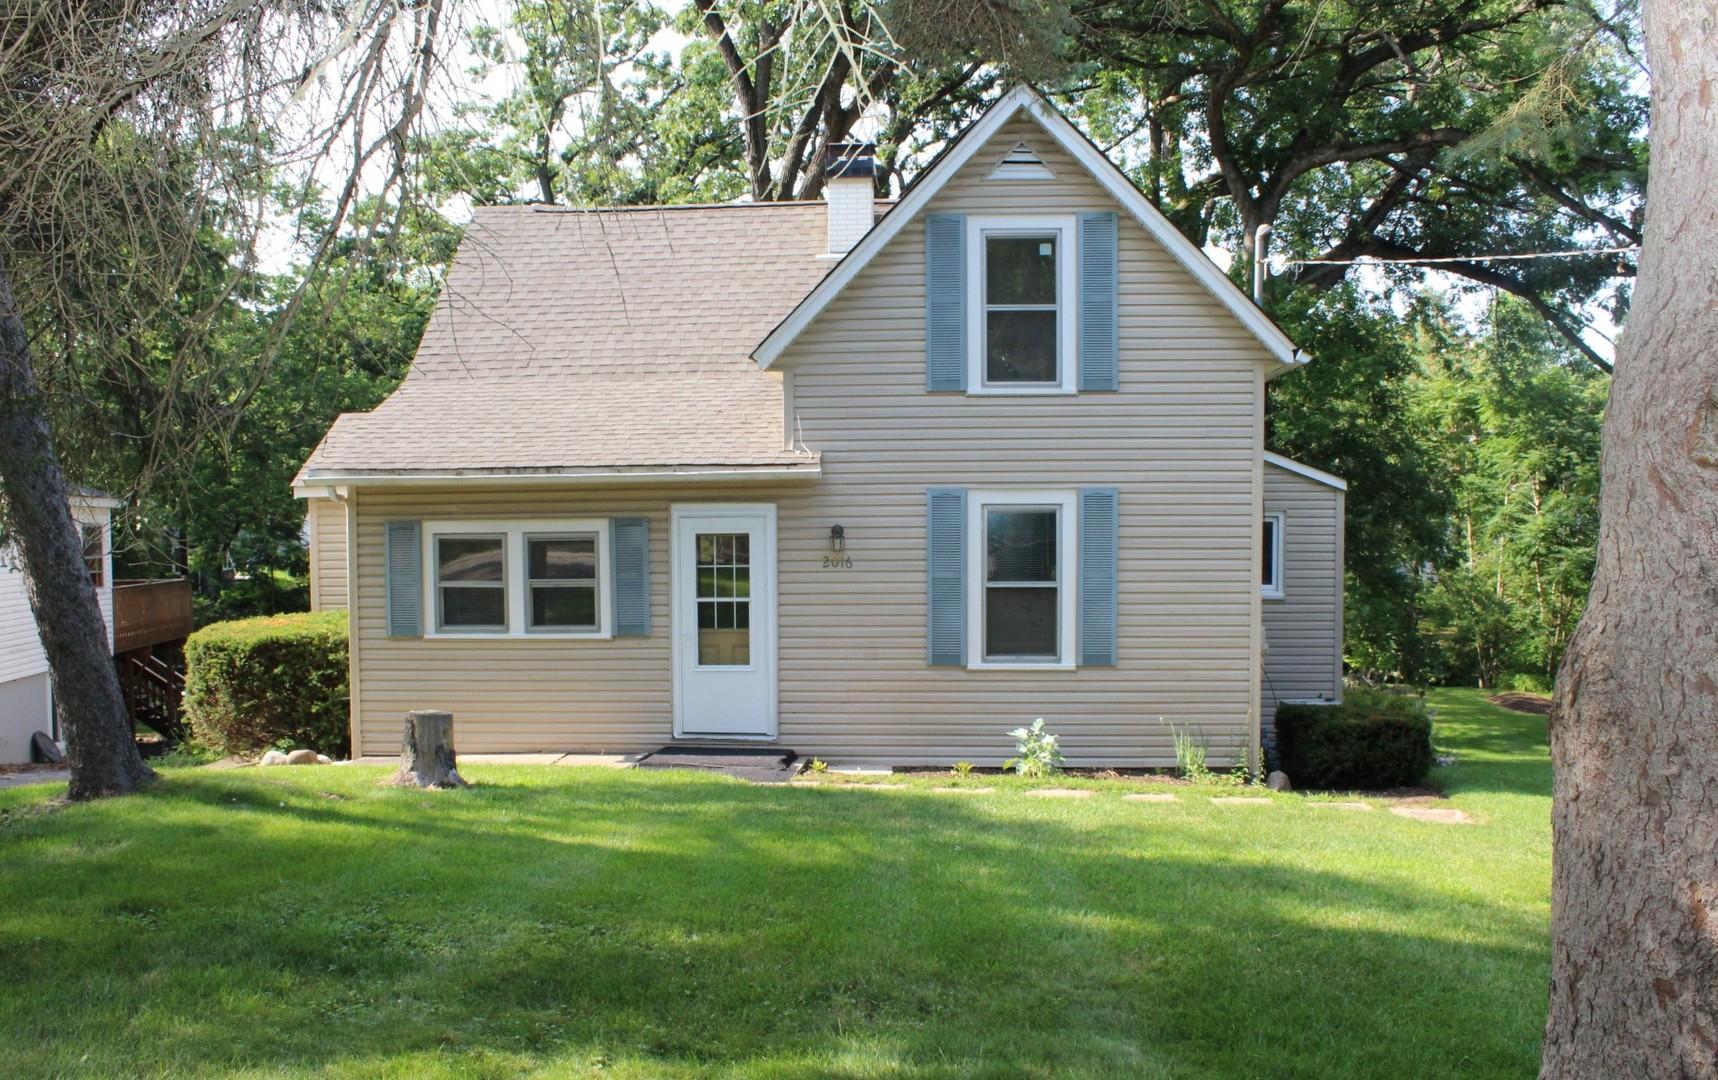 2016 Grove Lane, Cary, IL 60013